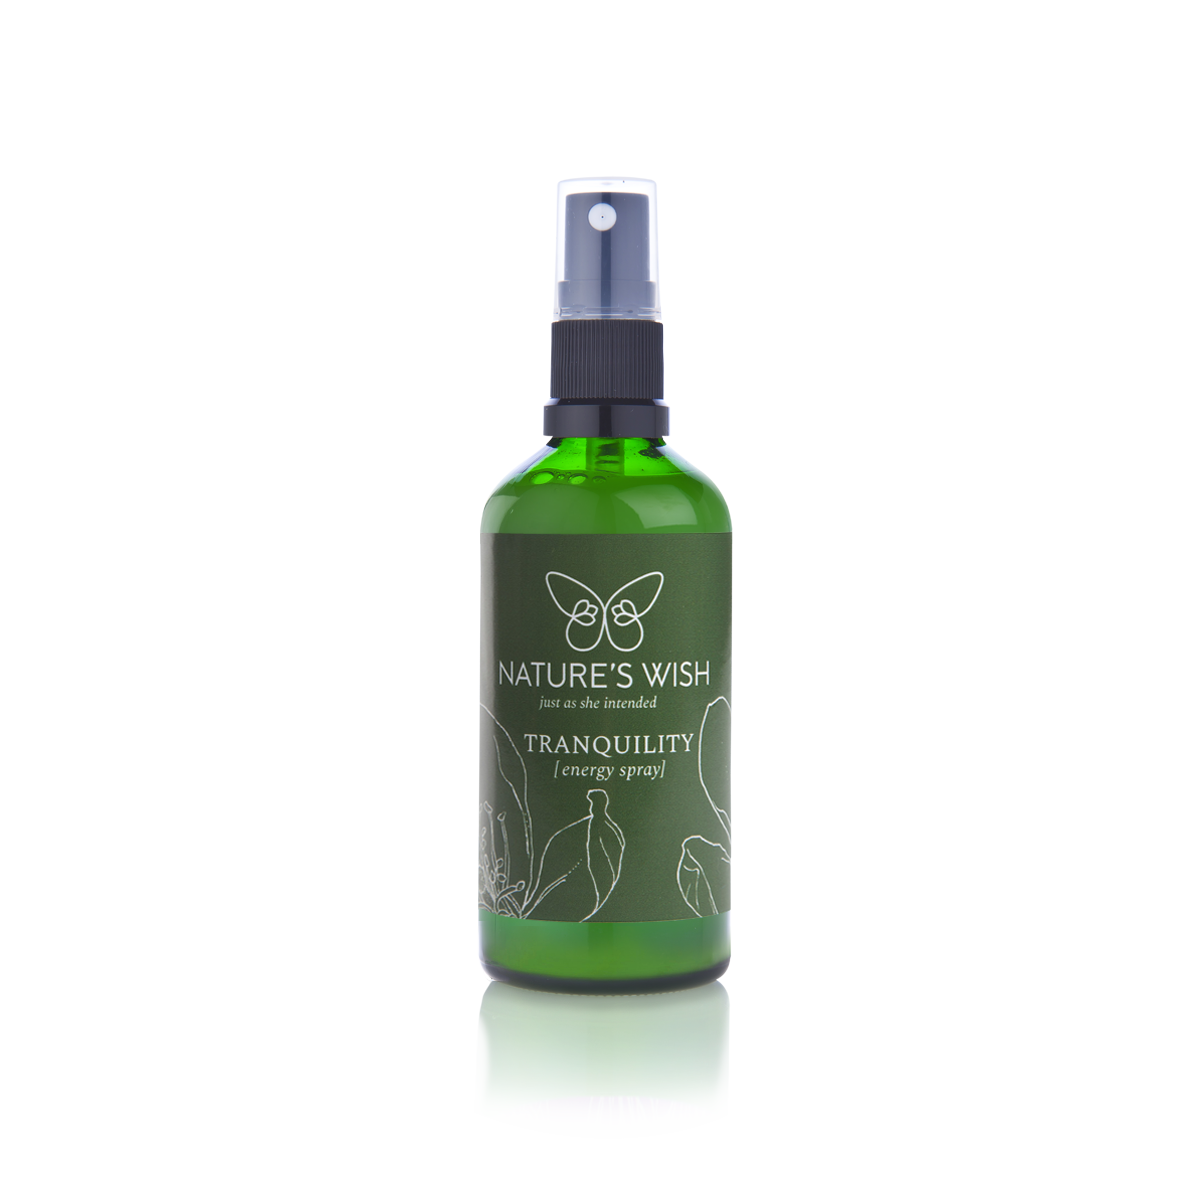 neroli-mandarin-rose-otto-daisy-impatiens-lavender-walnut-flower-essence-aromatherapy-energy-spray